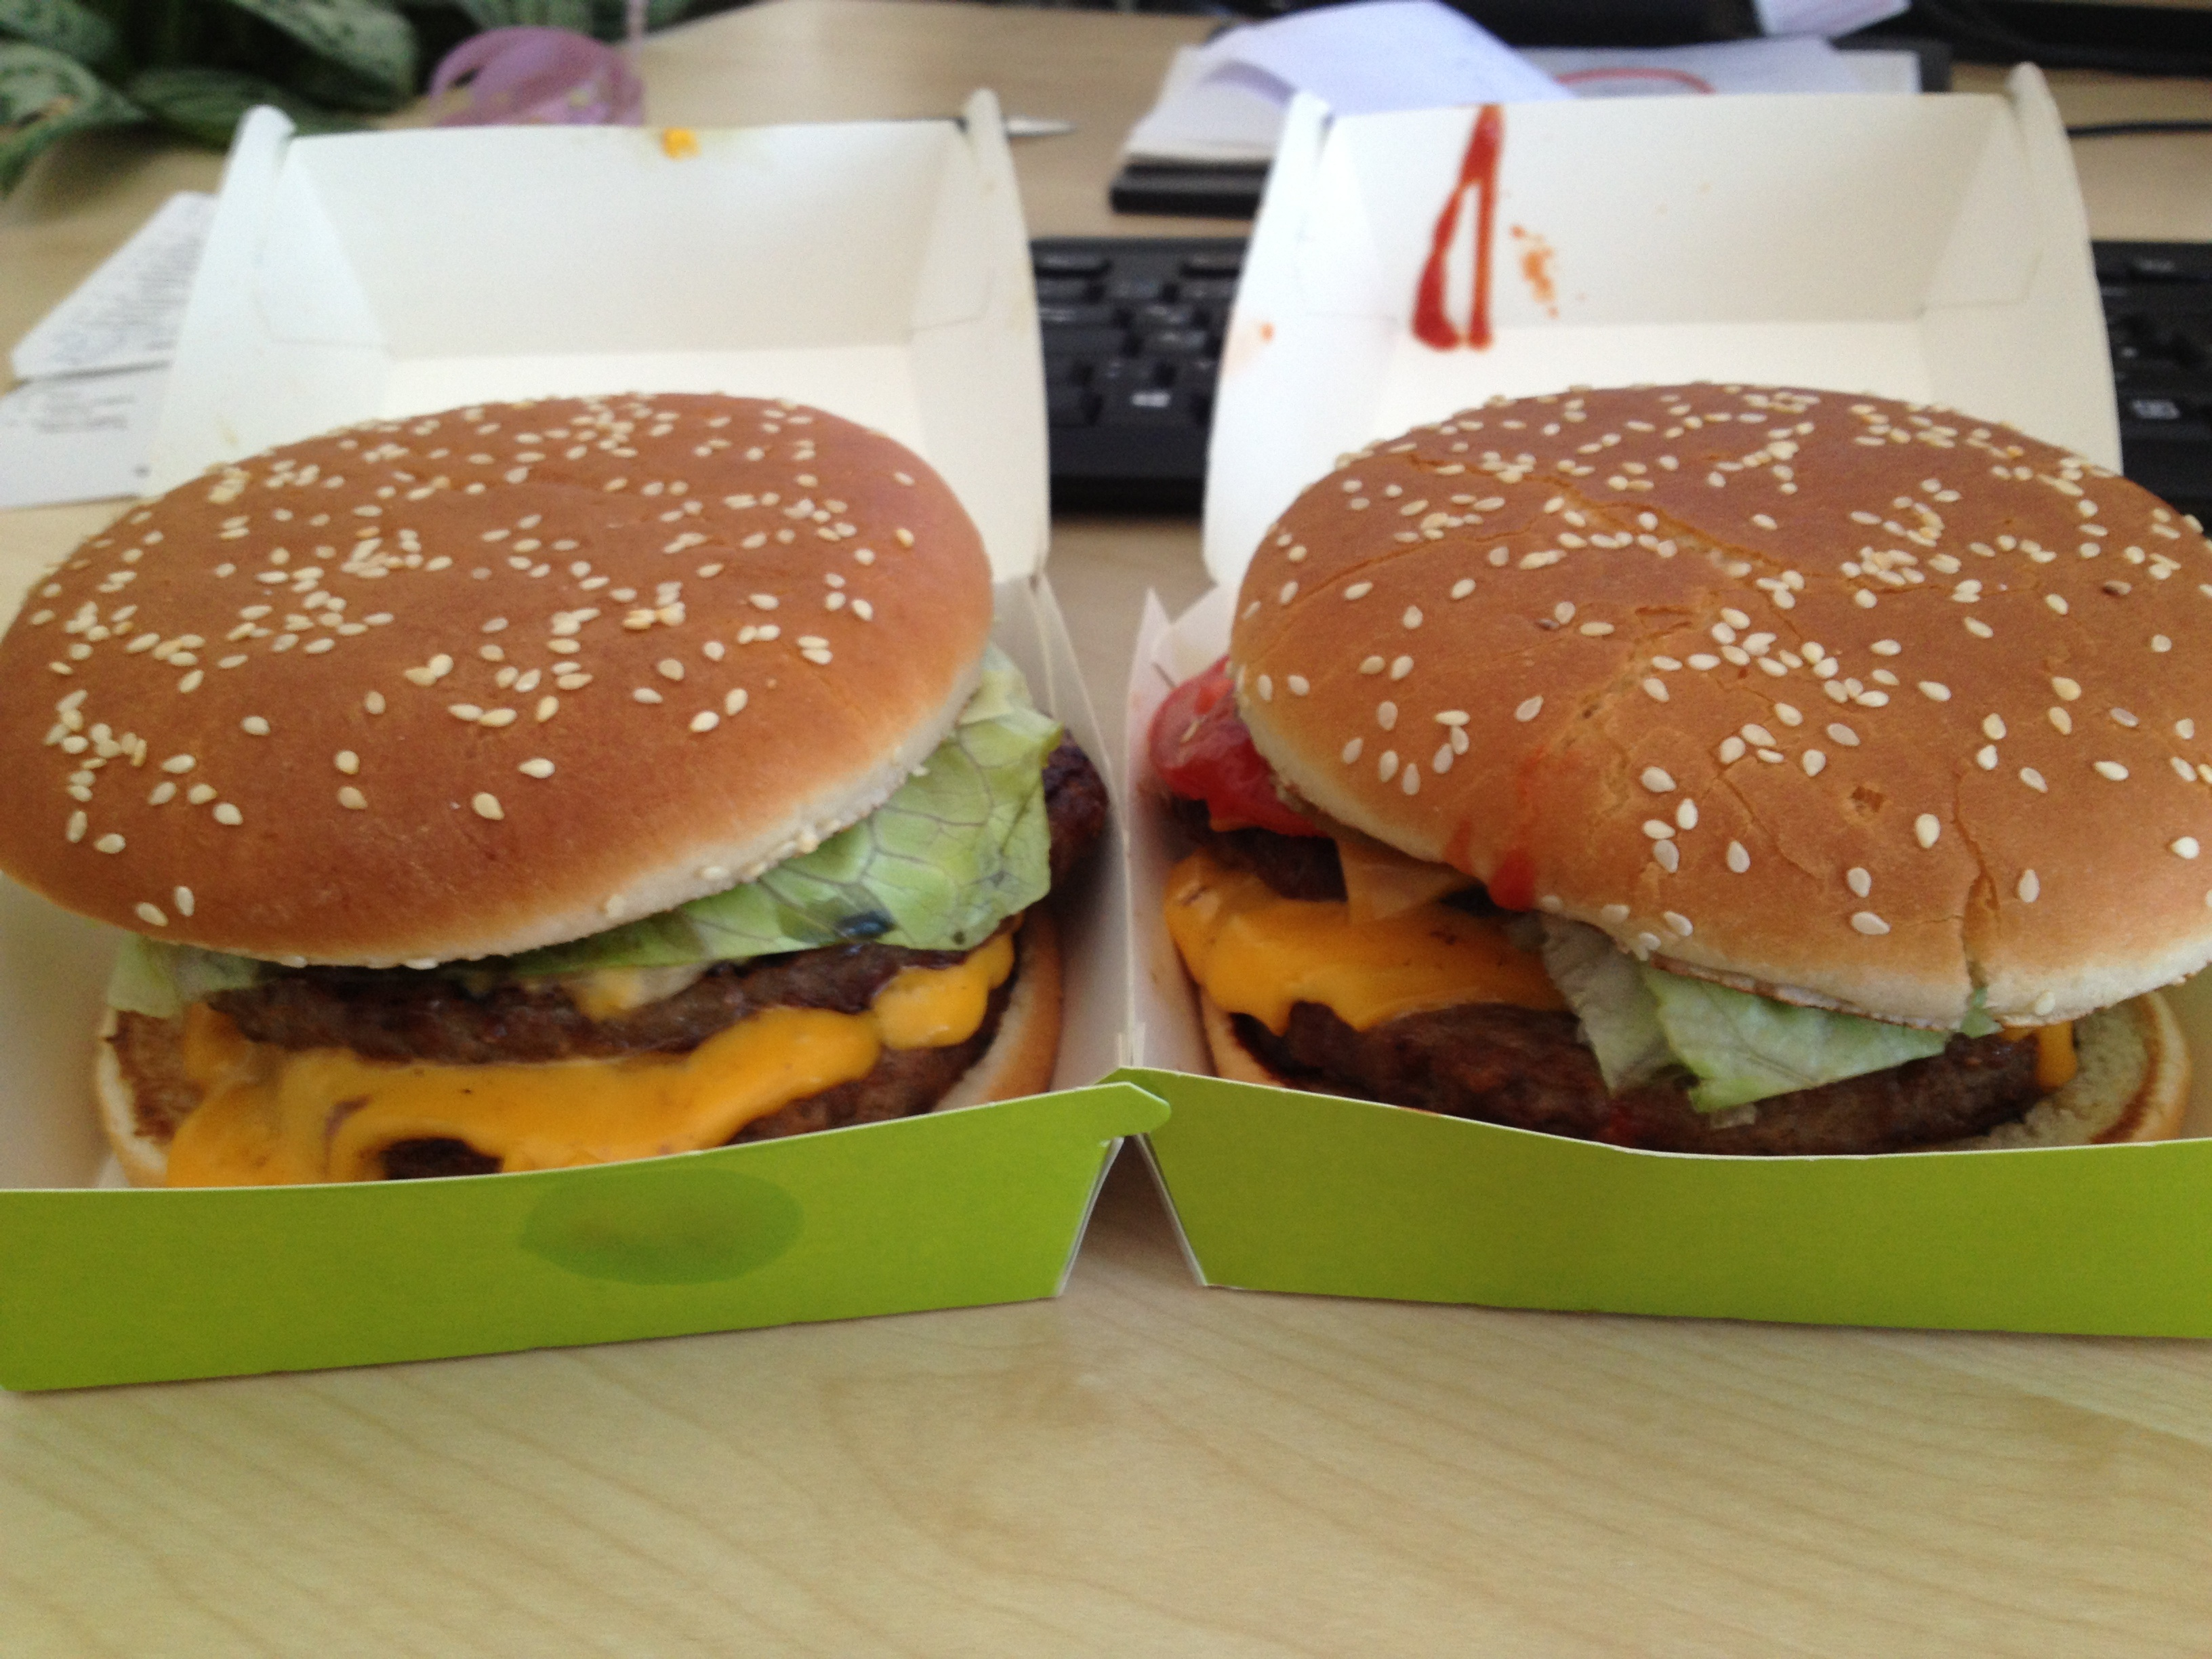 http://foodloader.net/BrollyLSSJ_2013-08-02_burgerme_-_2_DoubleMe_Cheeseburger.jpg